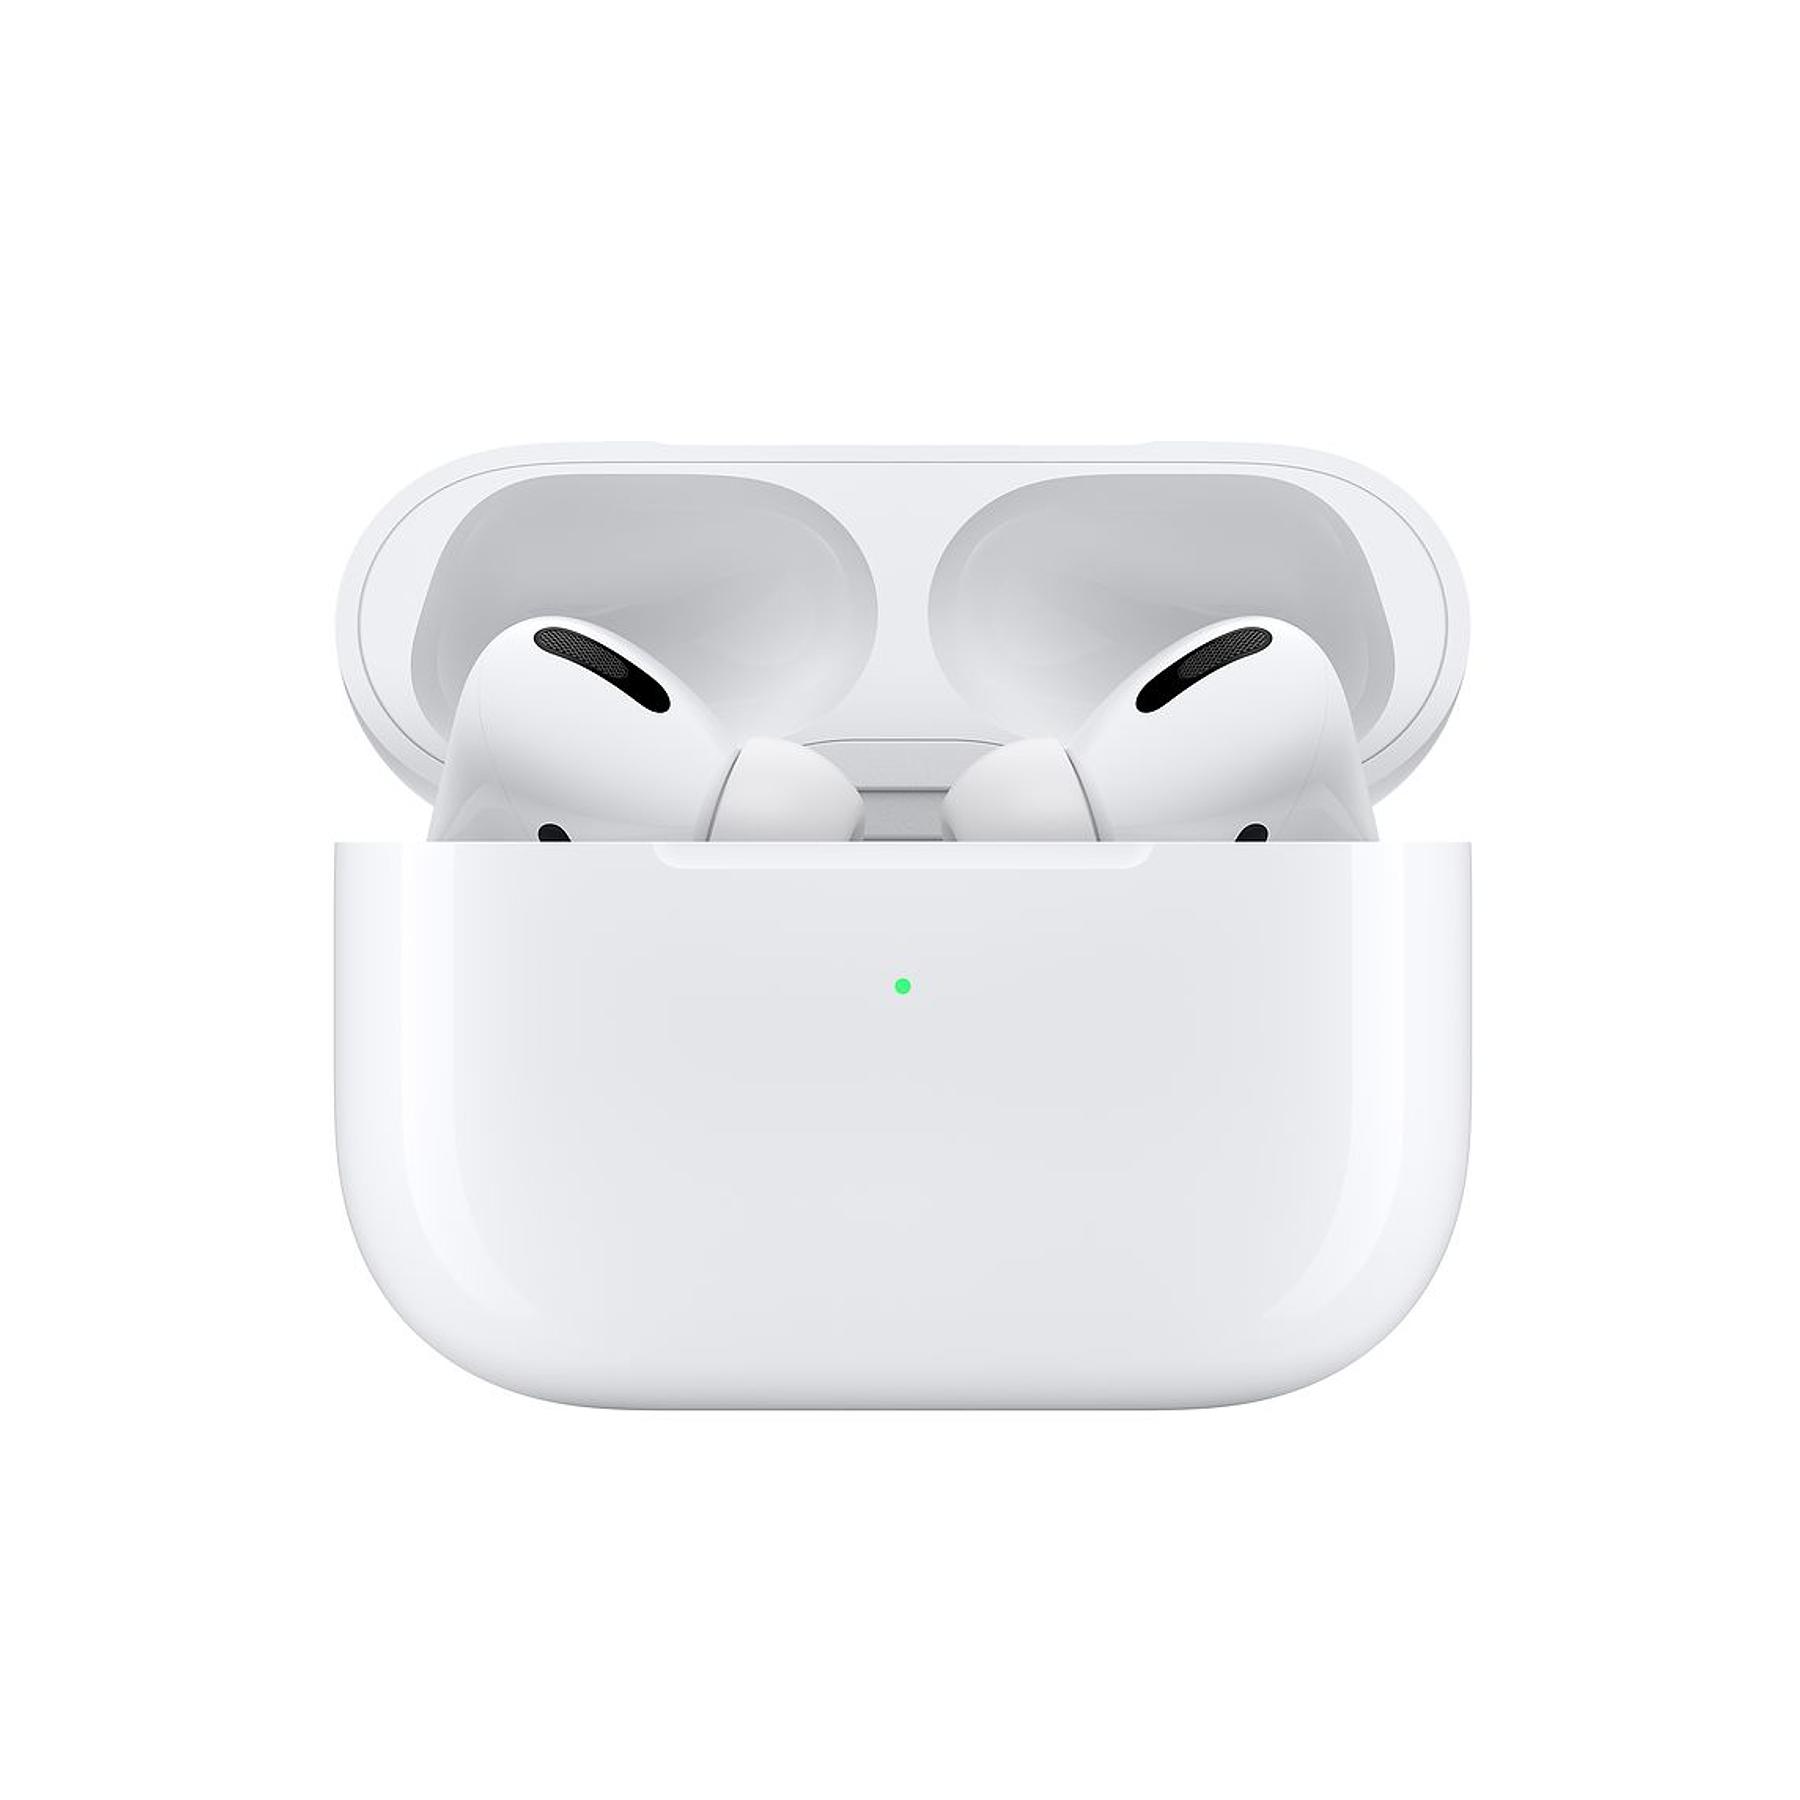 Audífonos AirPods Pro  (1:1)